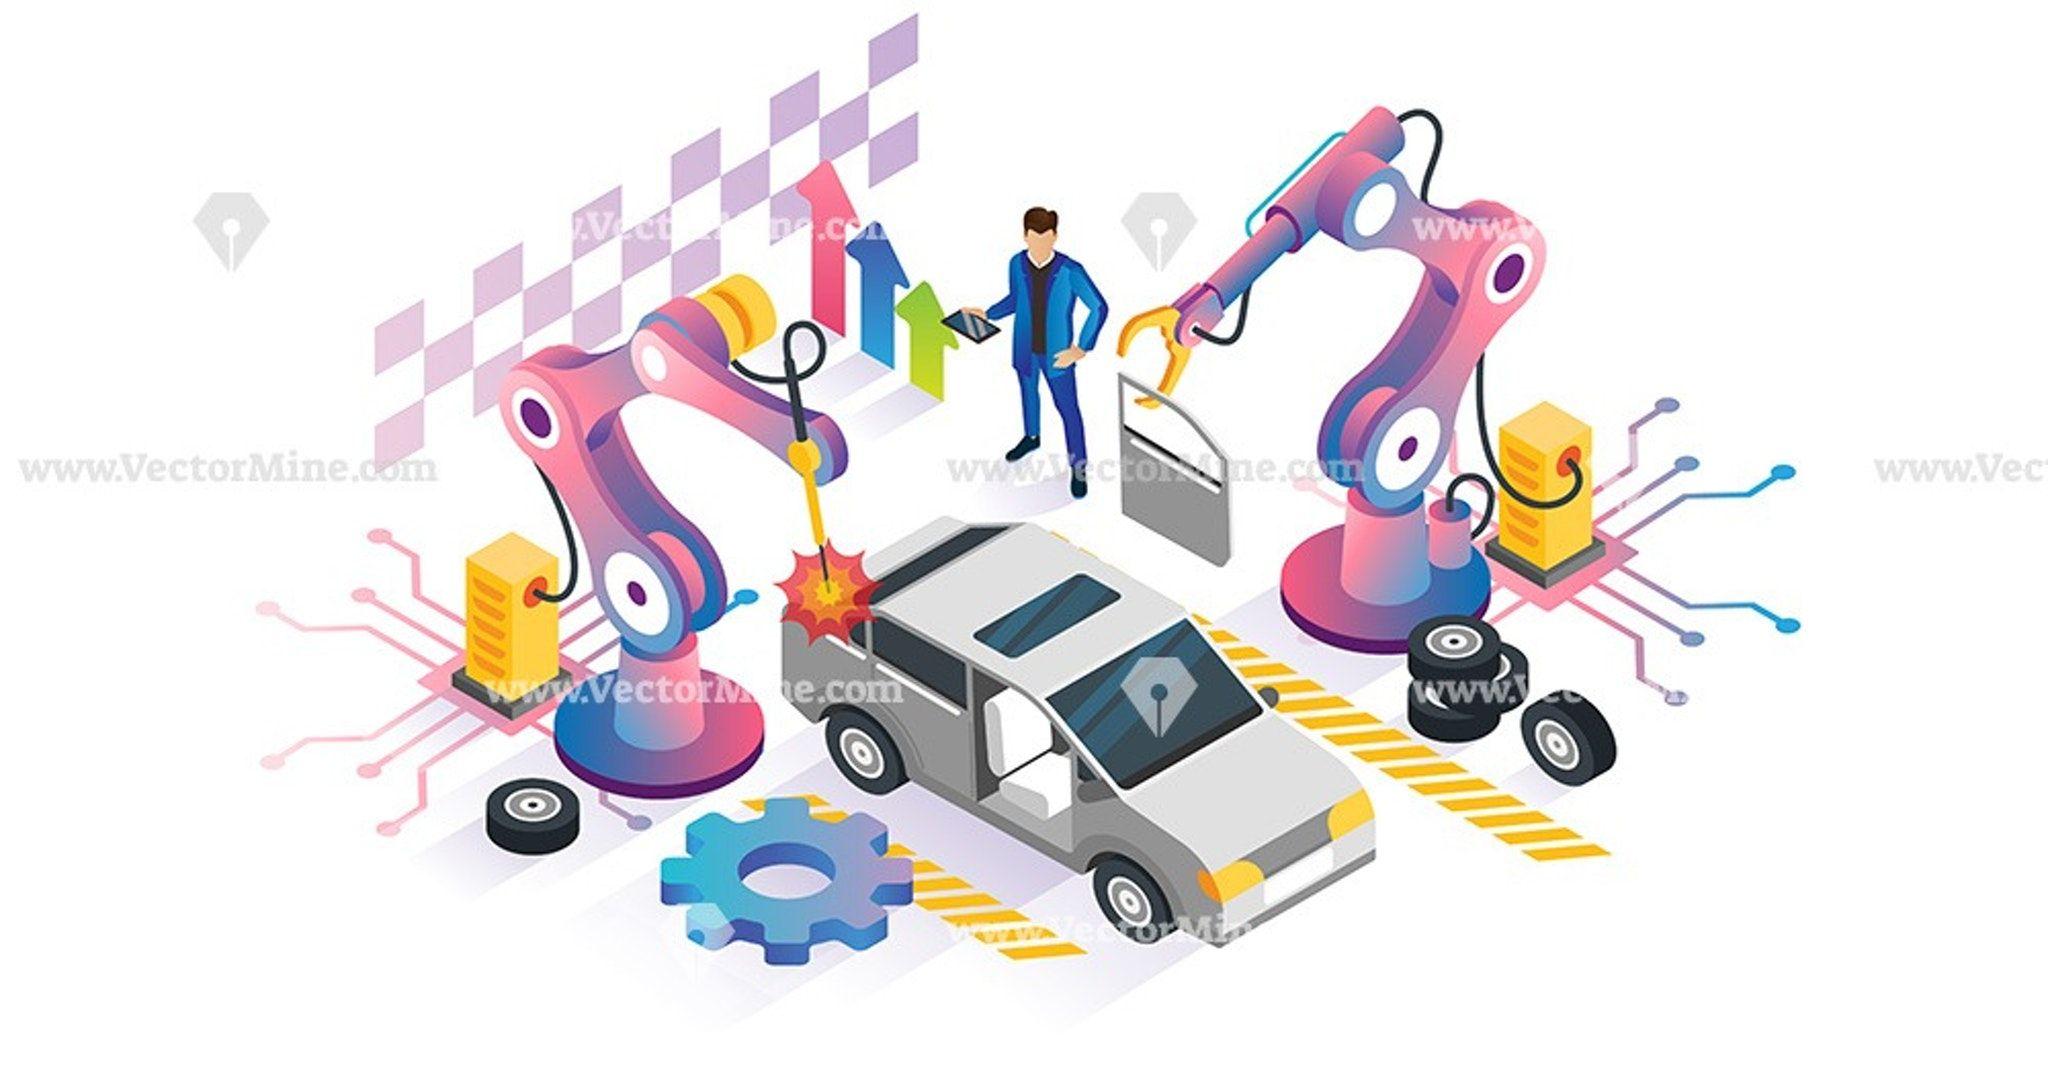 Robotics automation isometric vector illustration concept